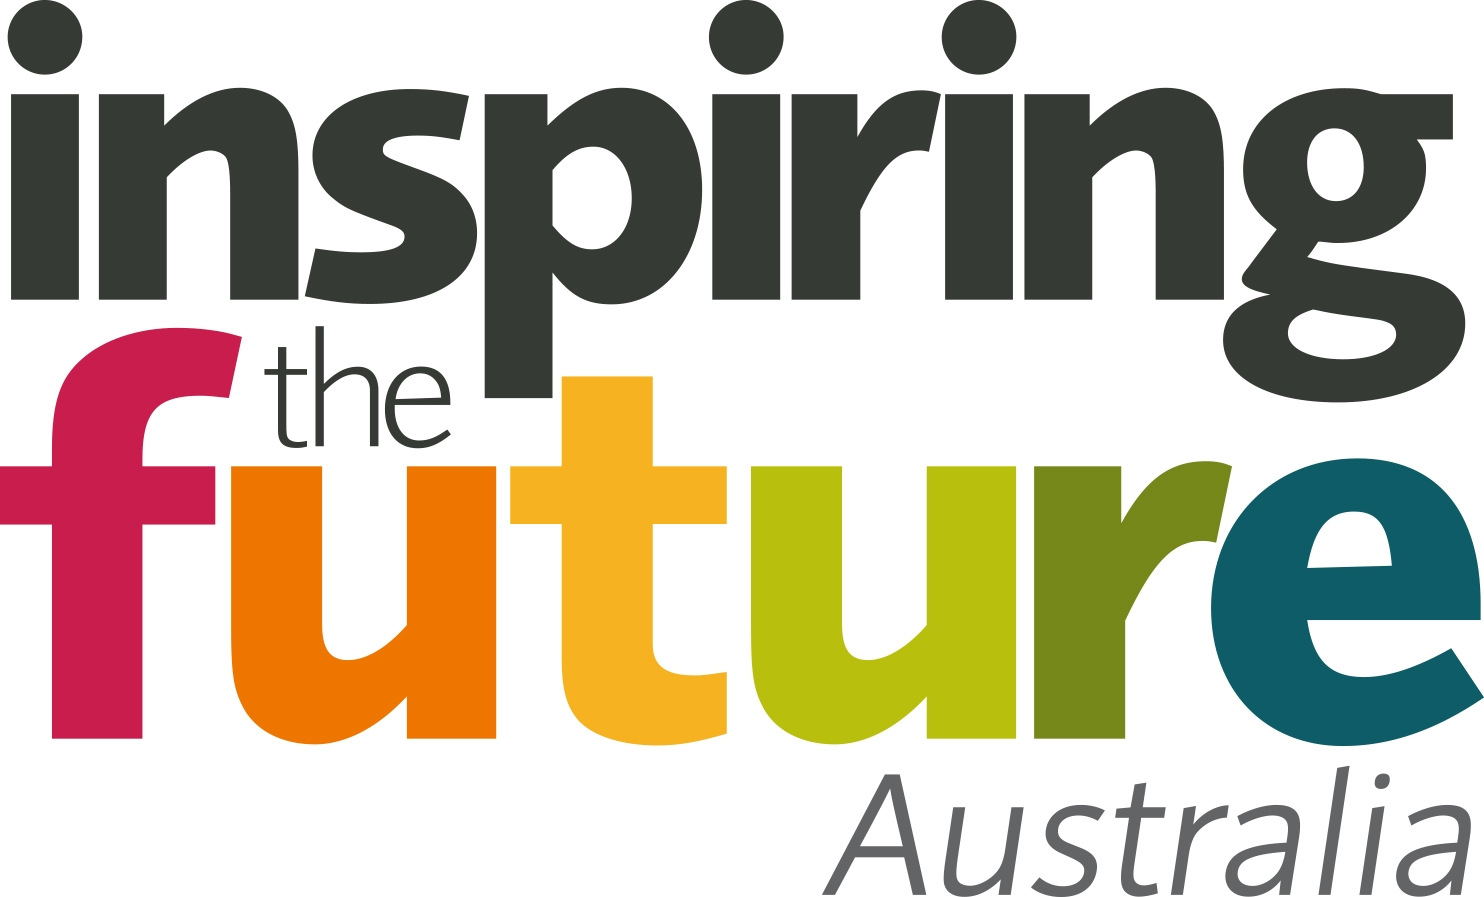 Inspiring the Future Australia